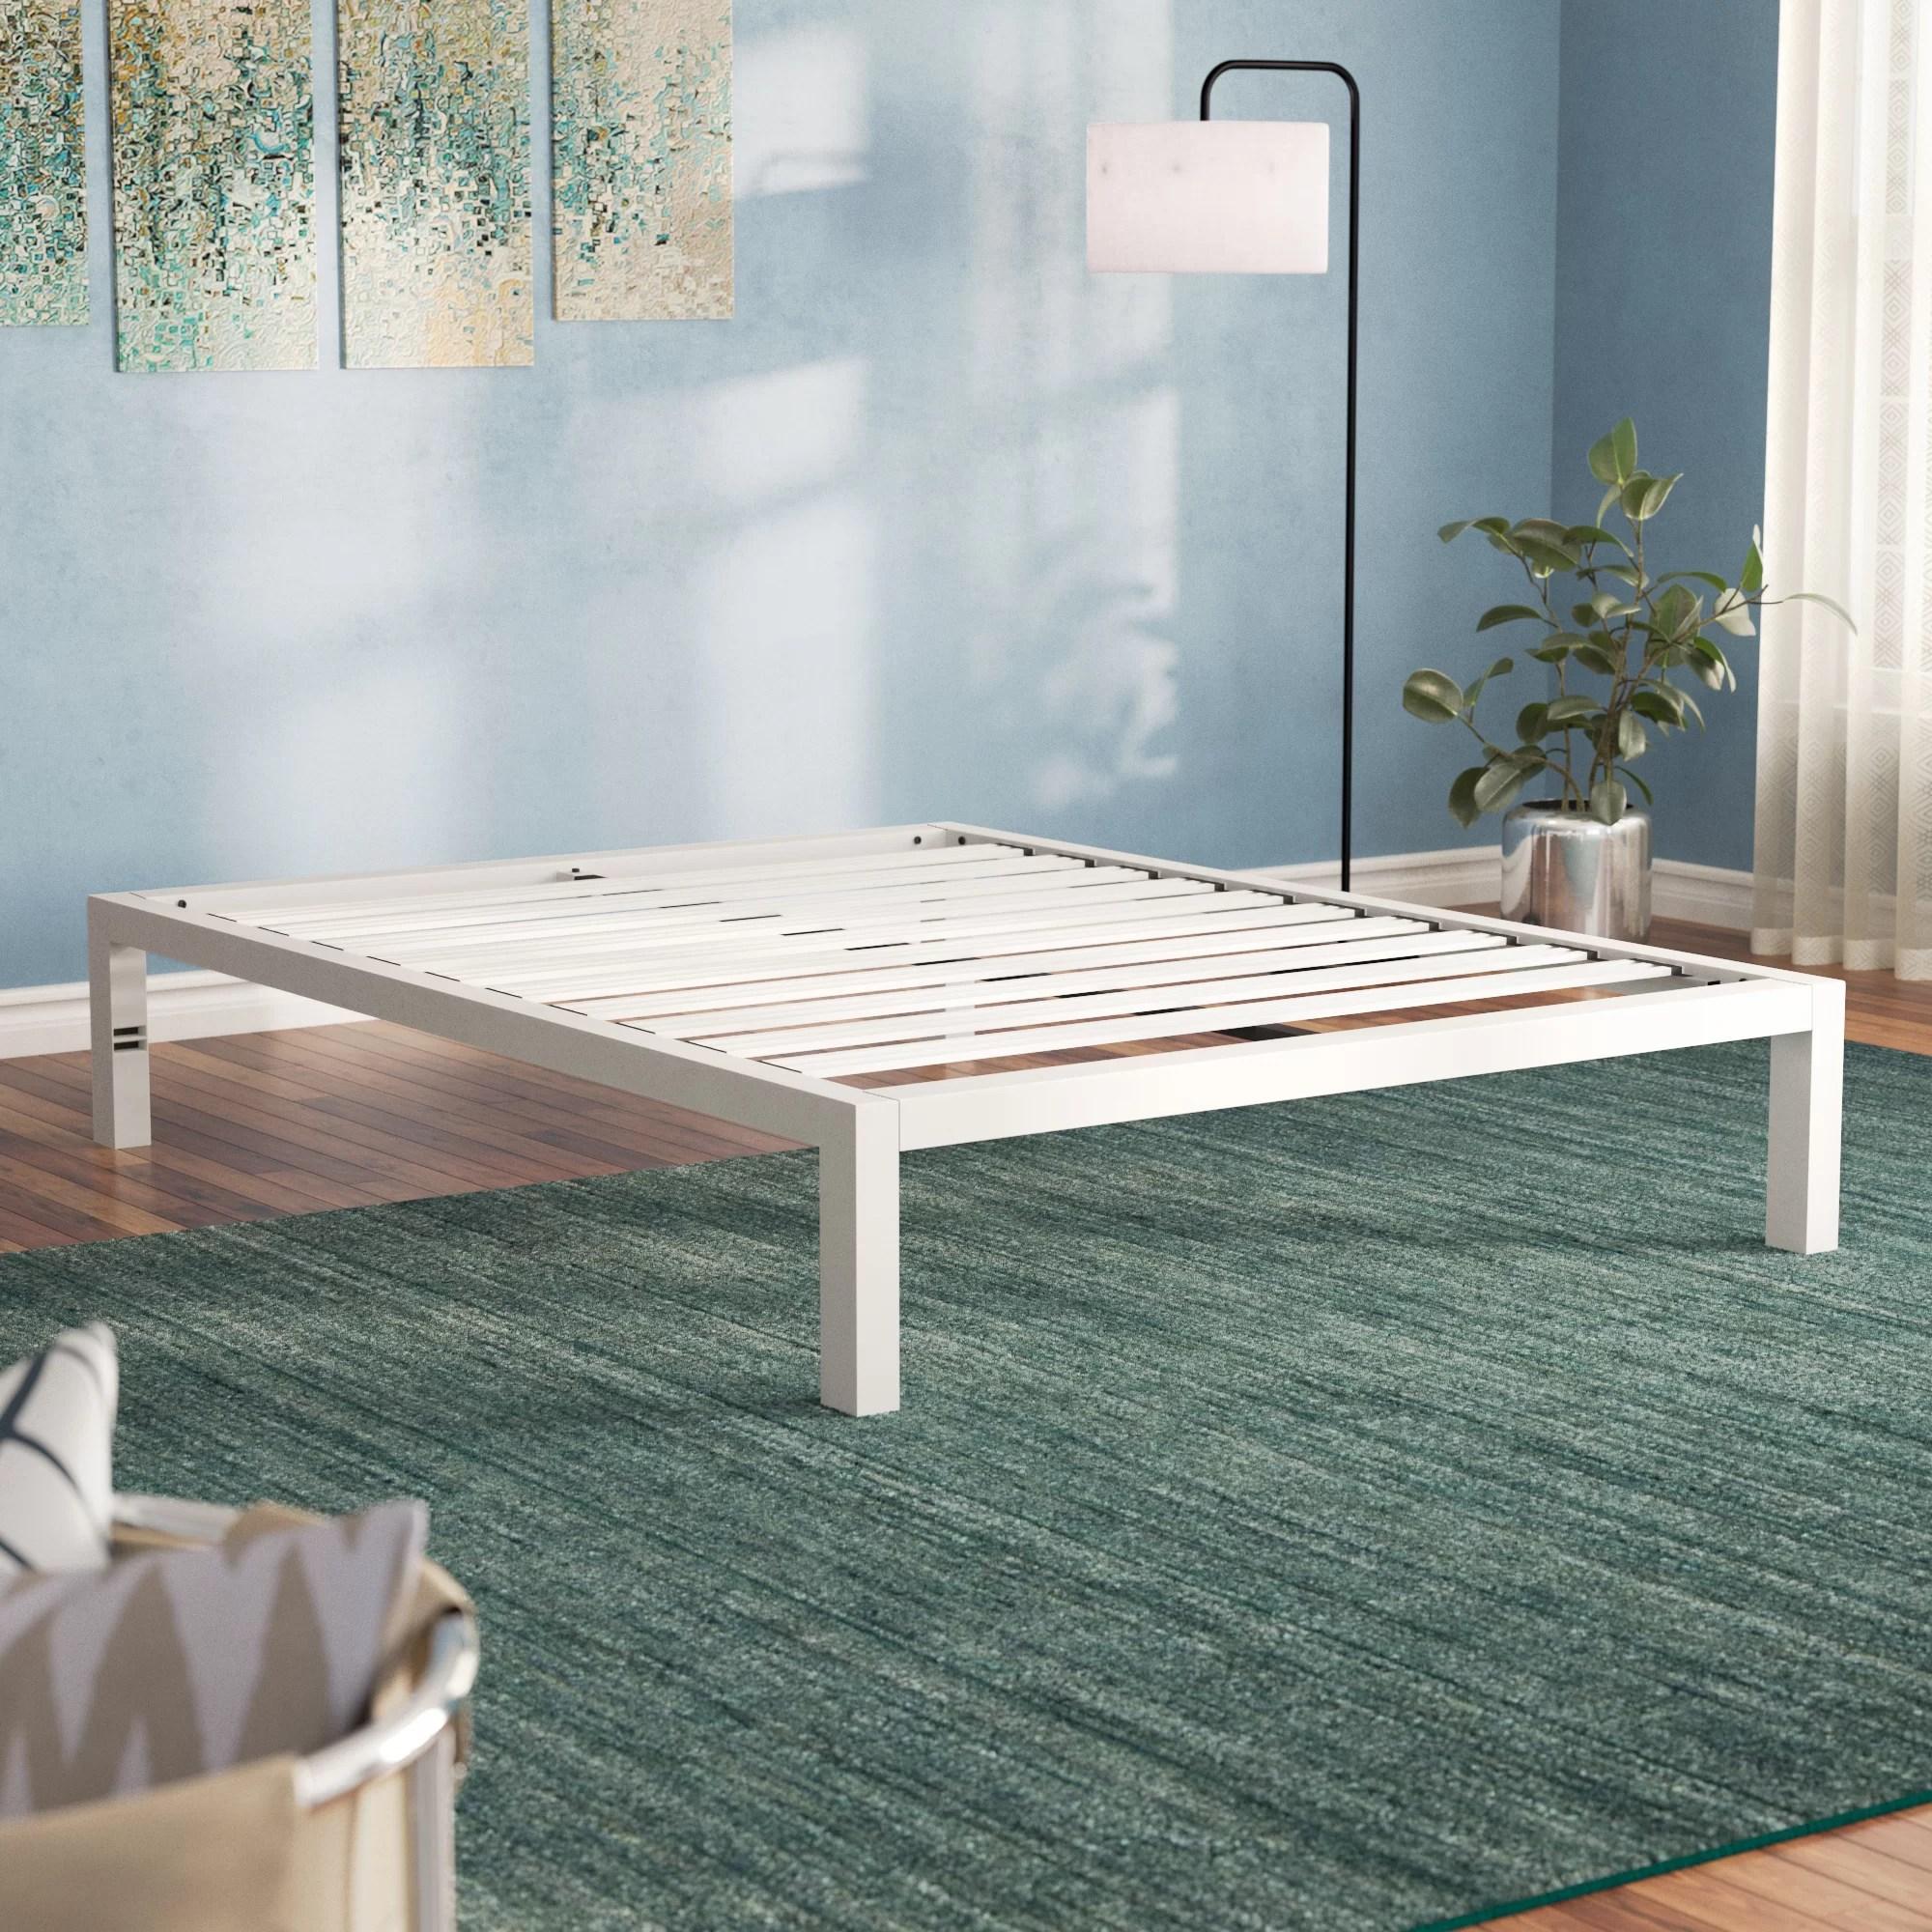 Alwyn Home Hammonds Steel Platform Bed Frame Reviews Wayfair